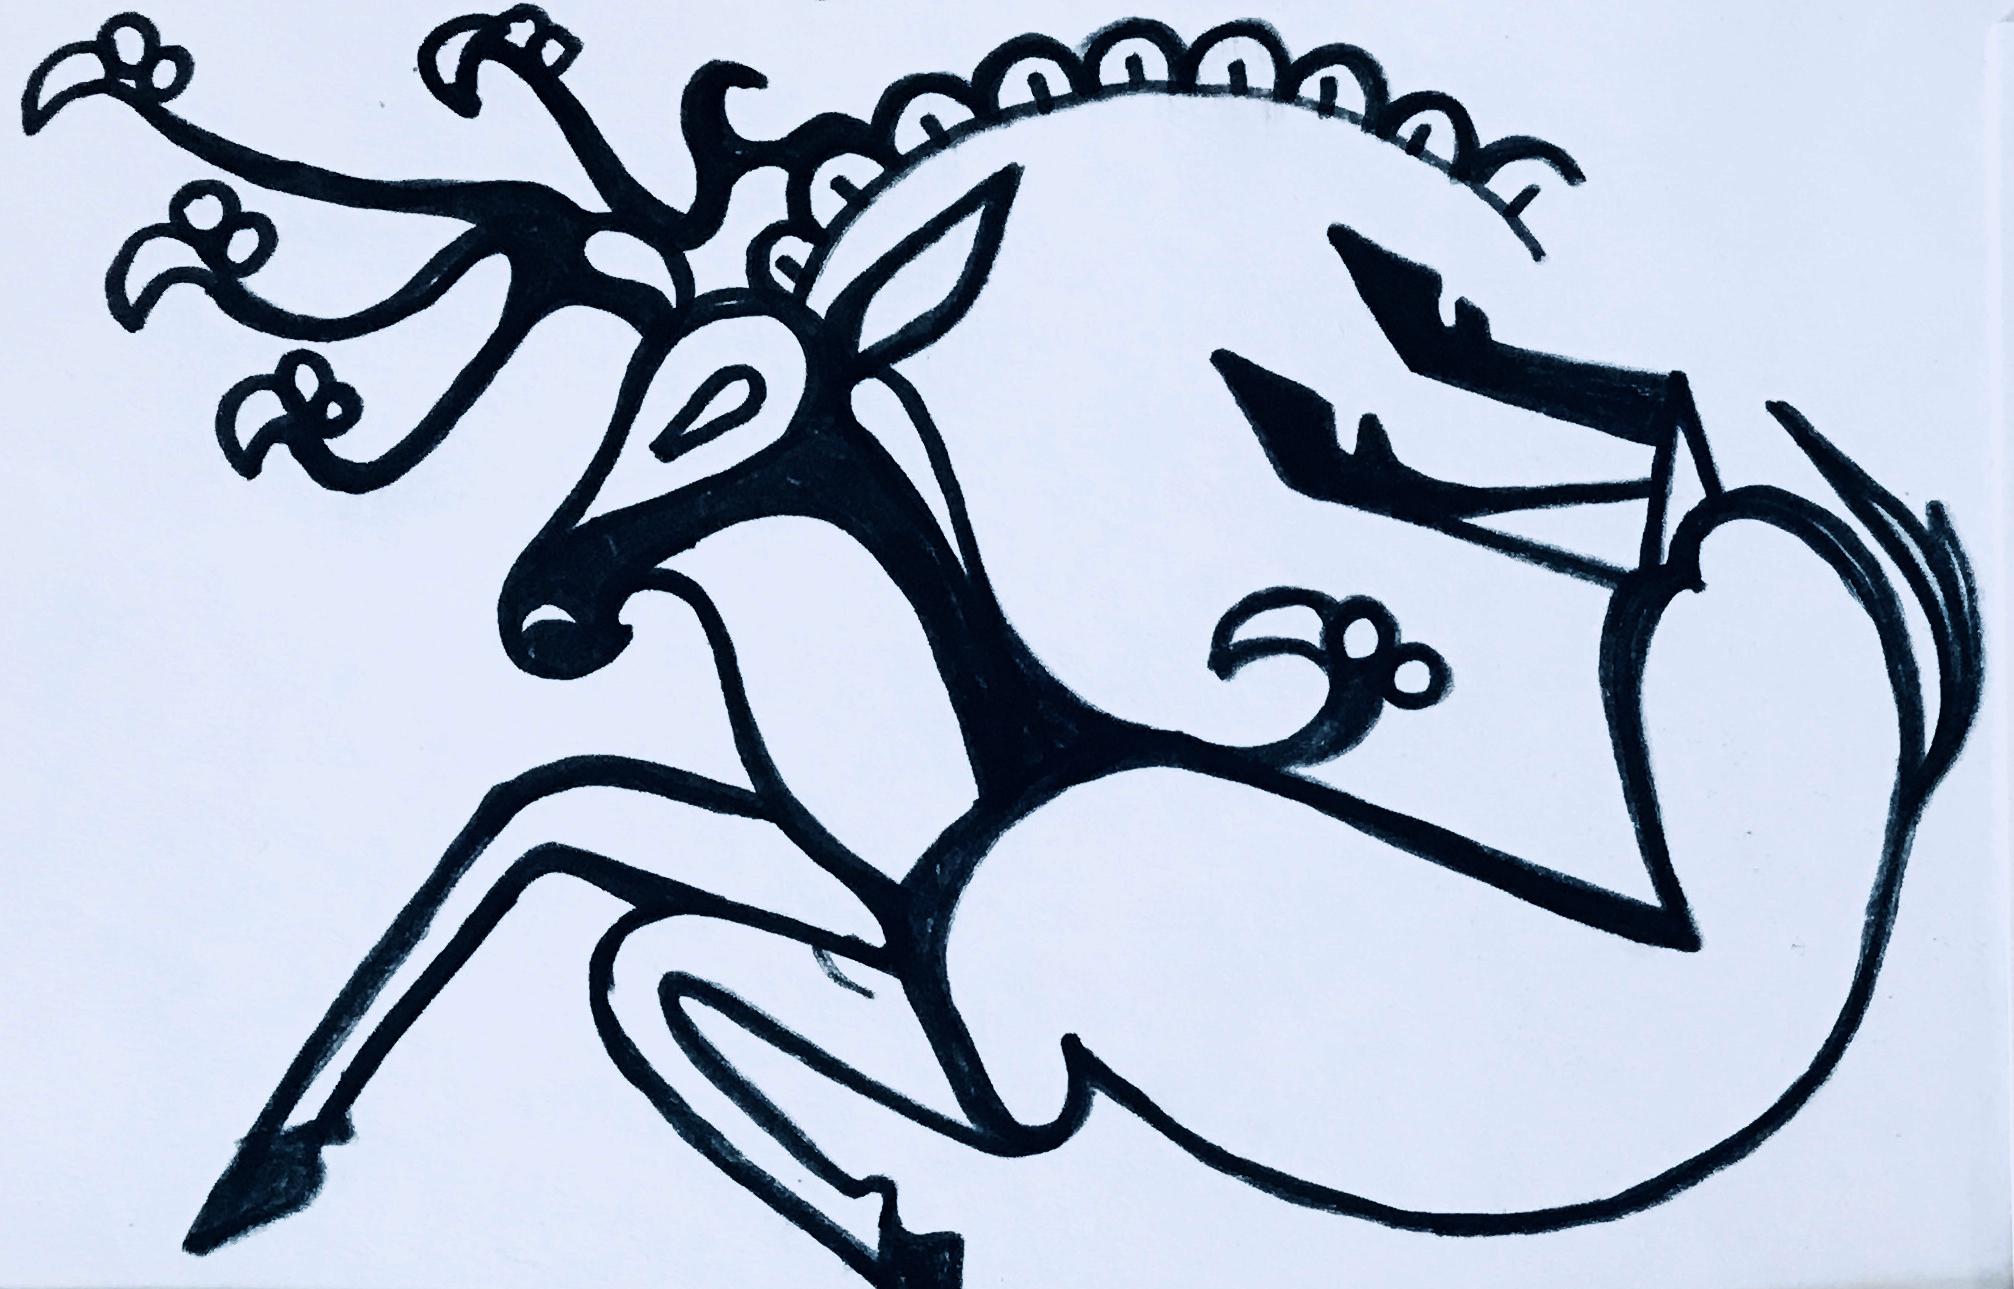 Siberian Ice Maiden Tattoo - Developing a design